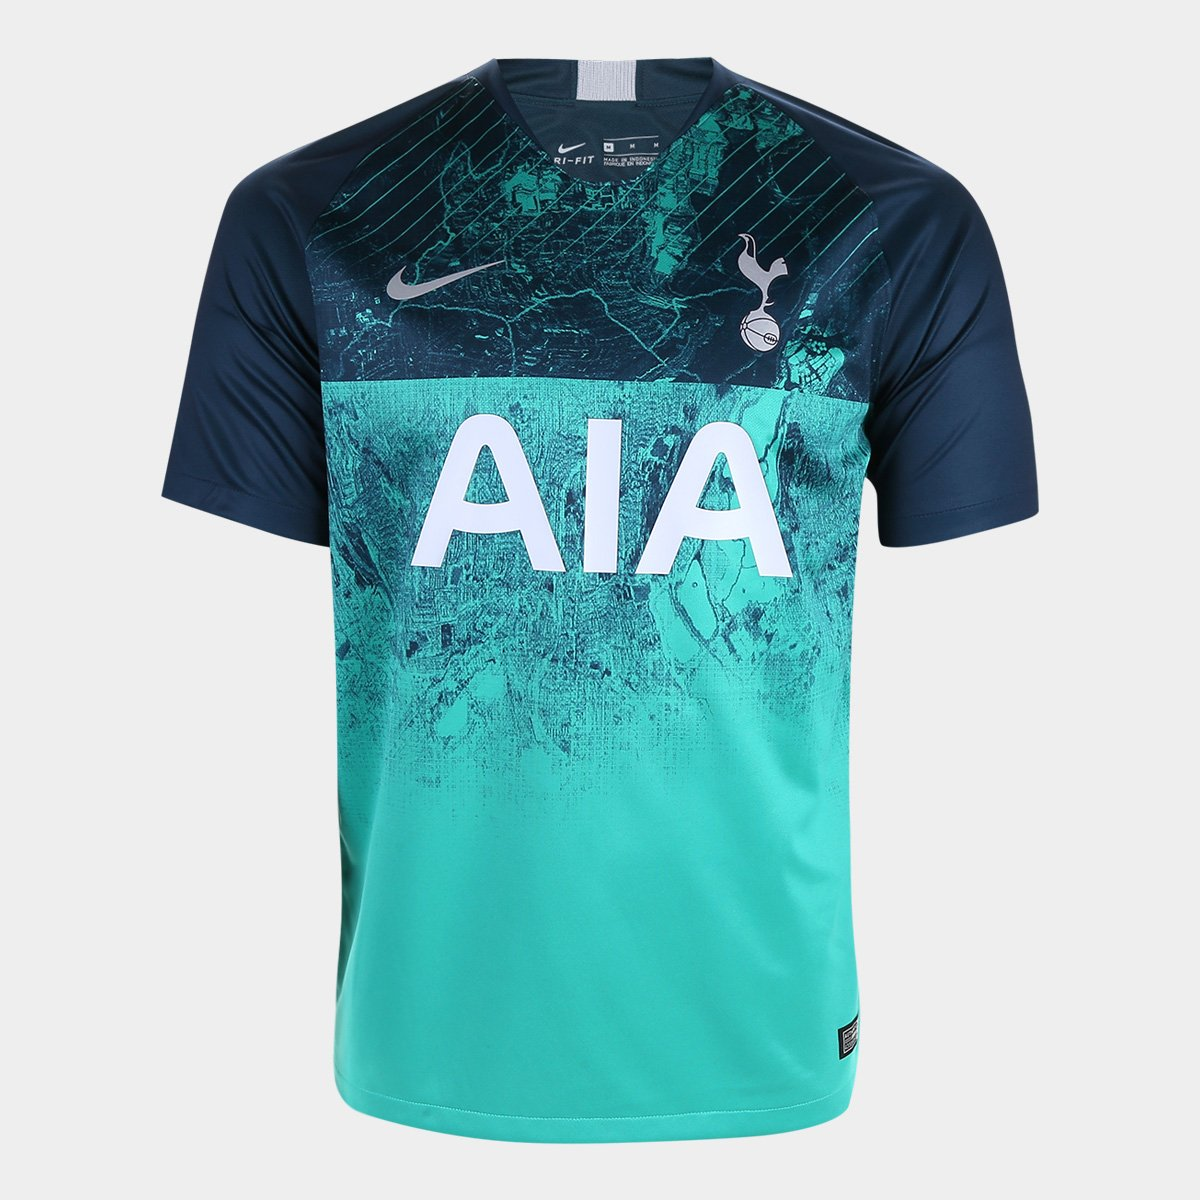 d297f4cdf7c9f Camisa Tottenham Third 2018 s n° - Torcedor Nike Masculina - Compre Agora